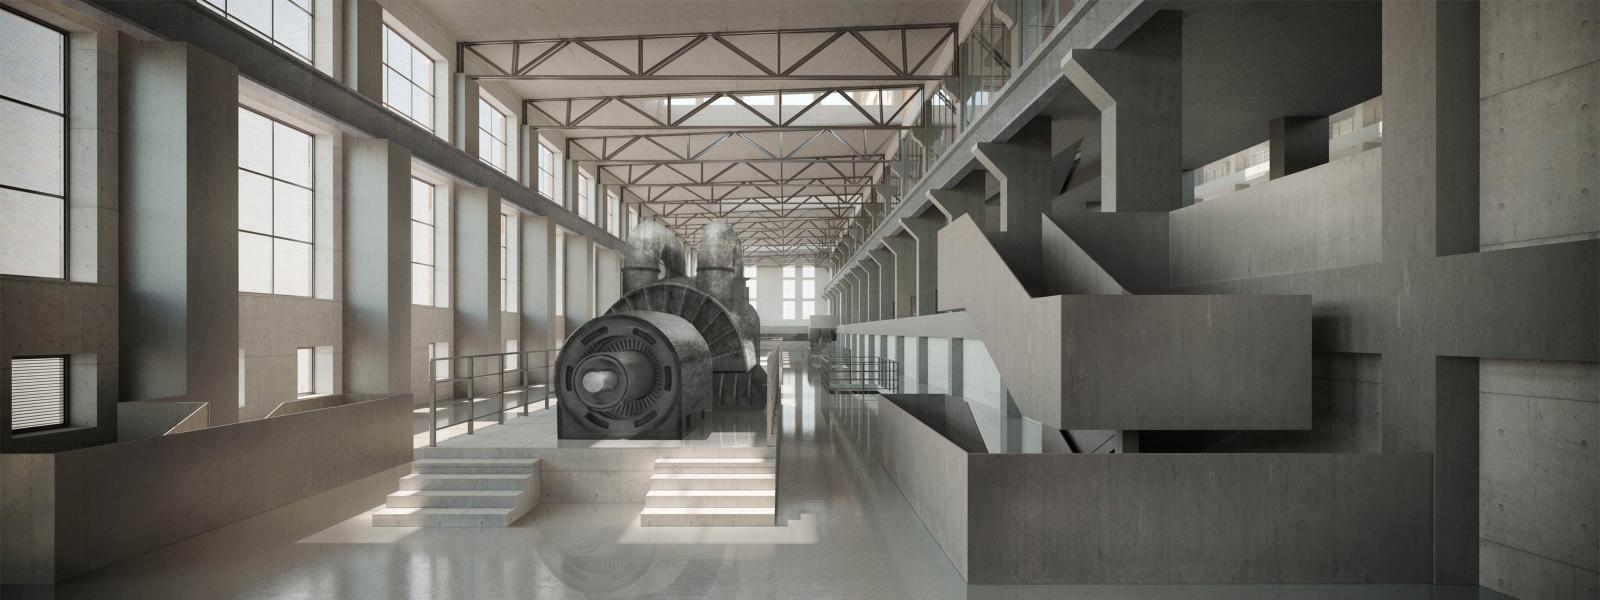 "work-""Энергокомбинат"": форум науки и техники в условиях реновации Самарской ГРЭС"